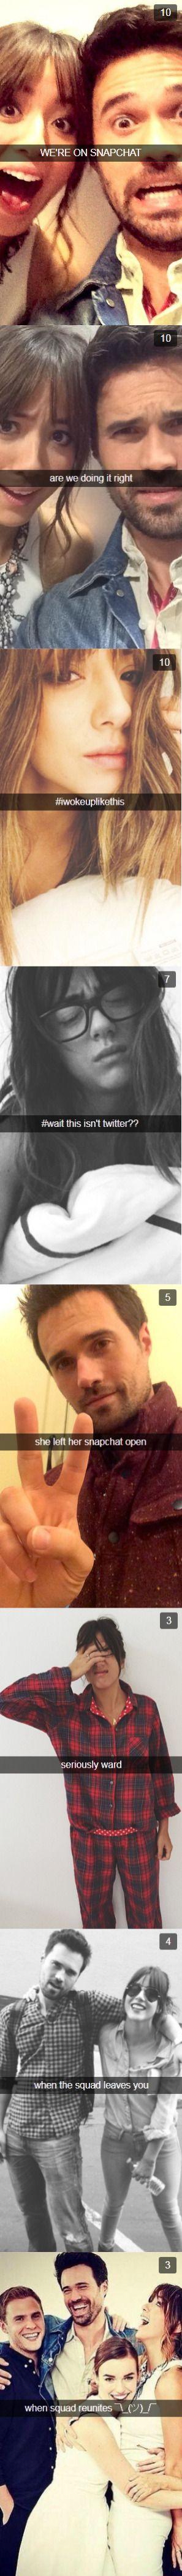 SkyeWard+ Snapchat= CUTENESS